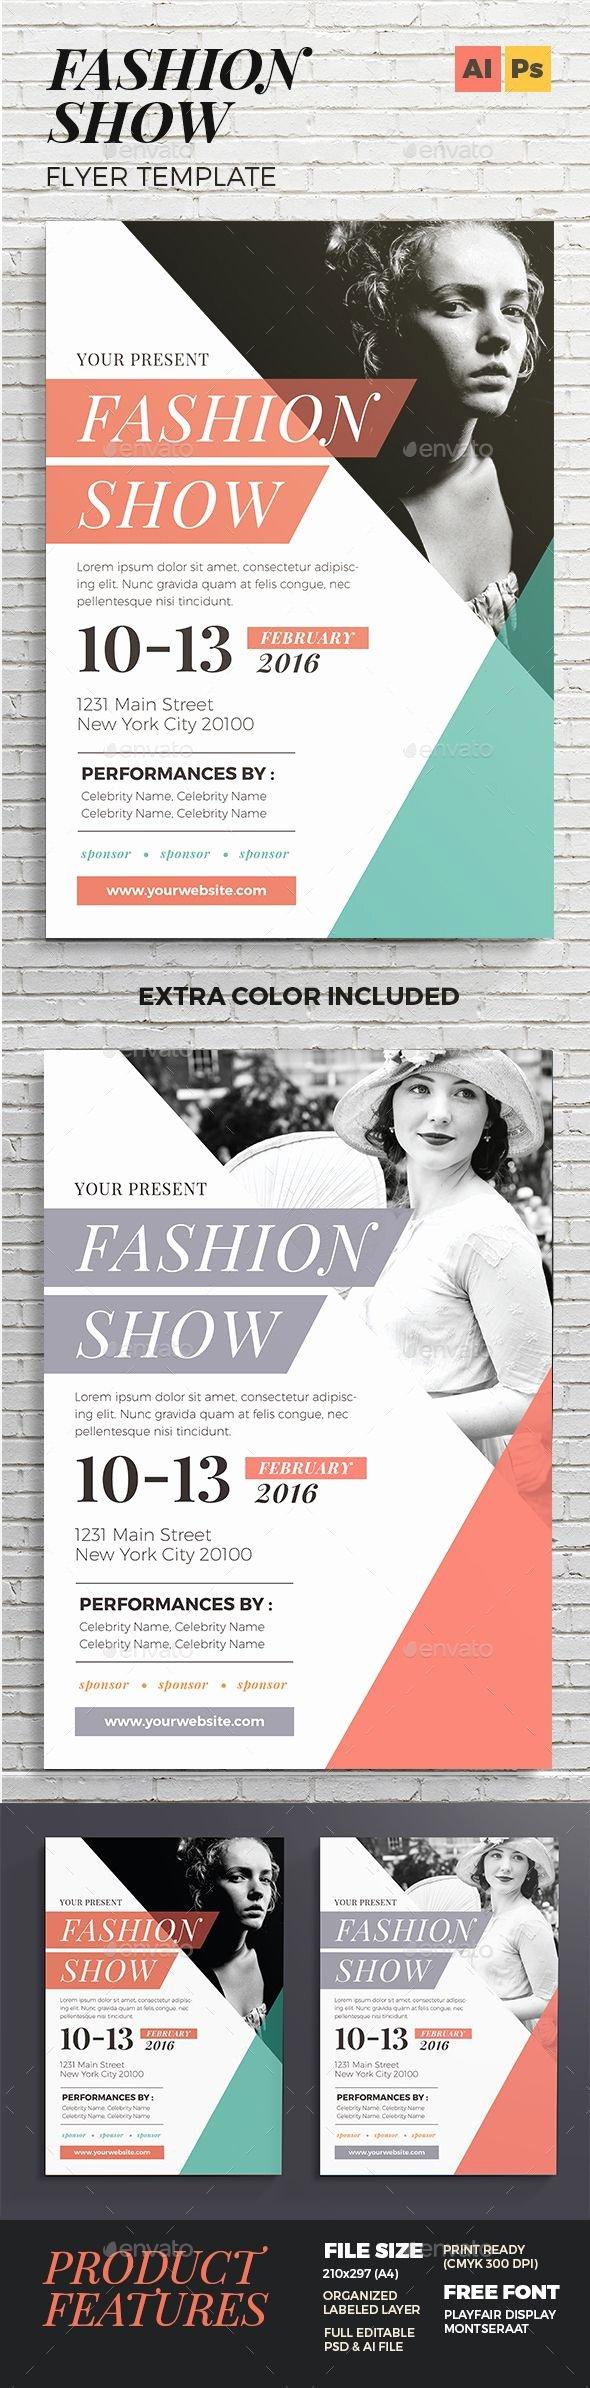 Fashion Show Flyers Template Beautiful Best 25 Flyer Design Ideas On Pinterest